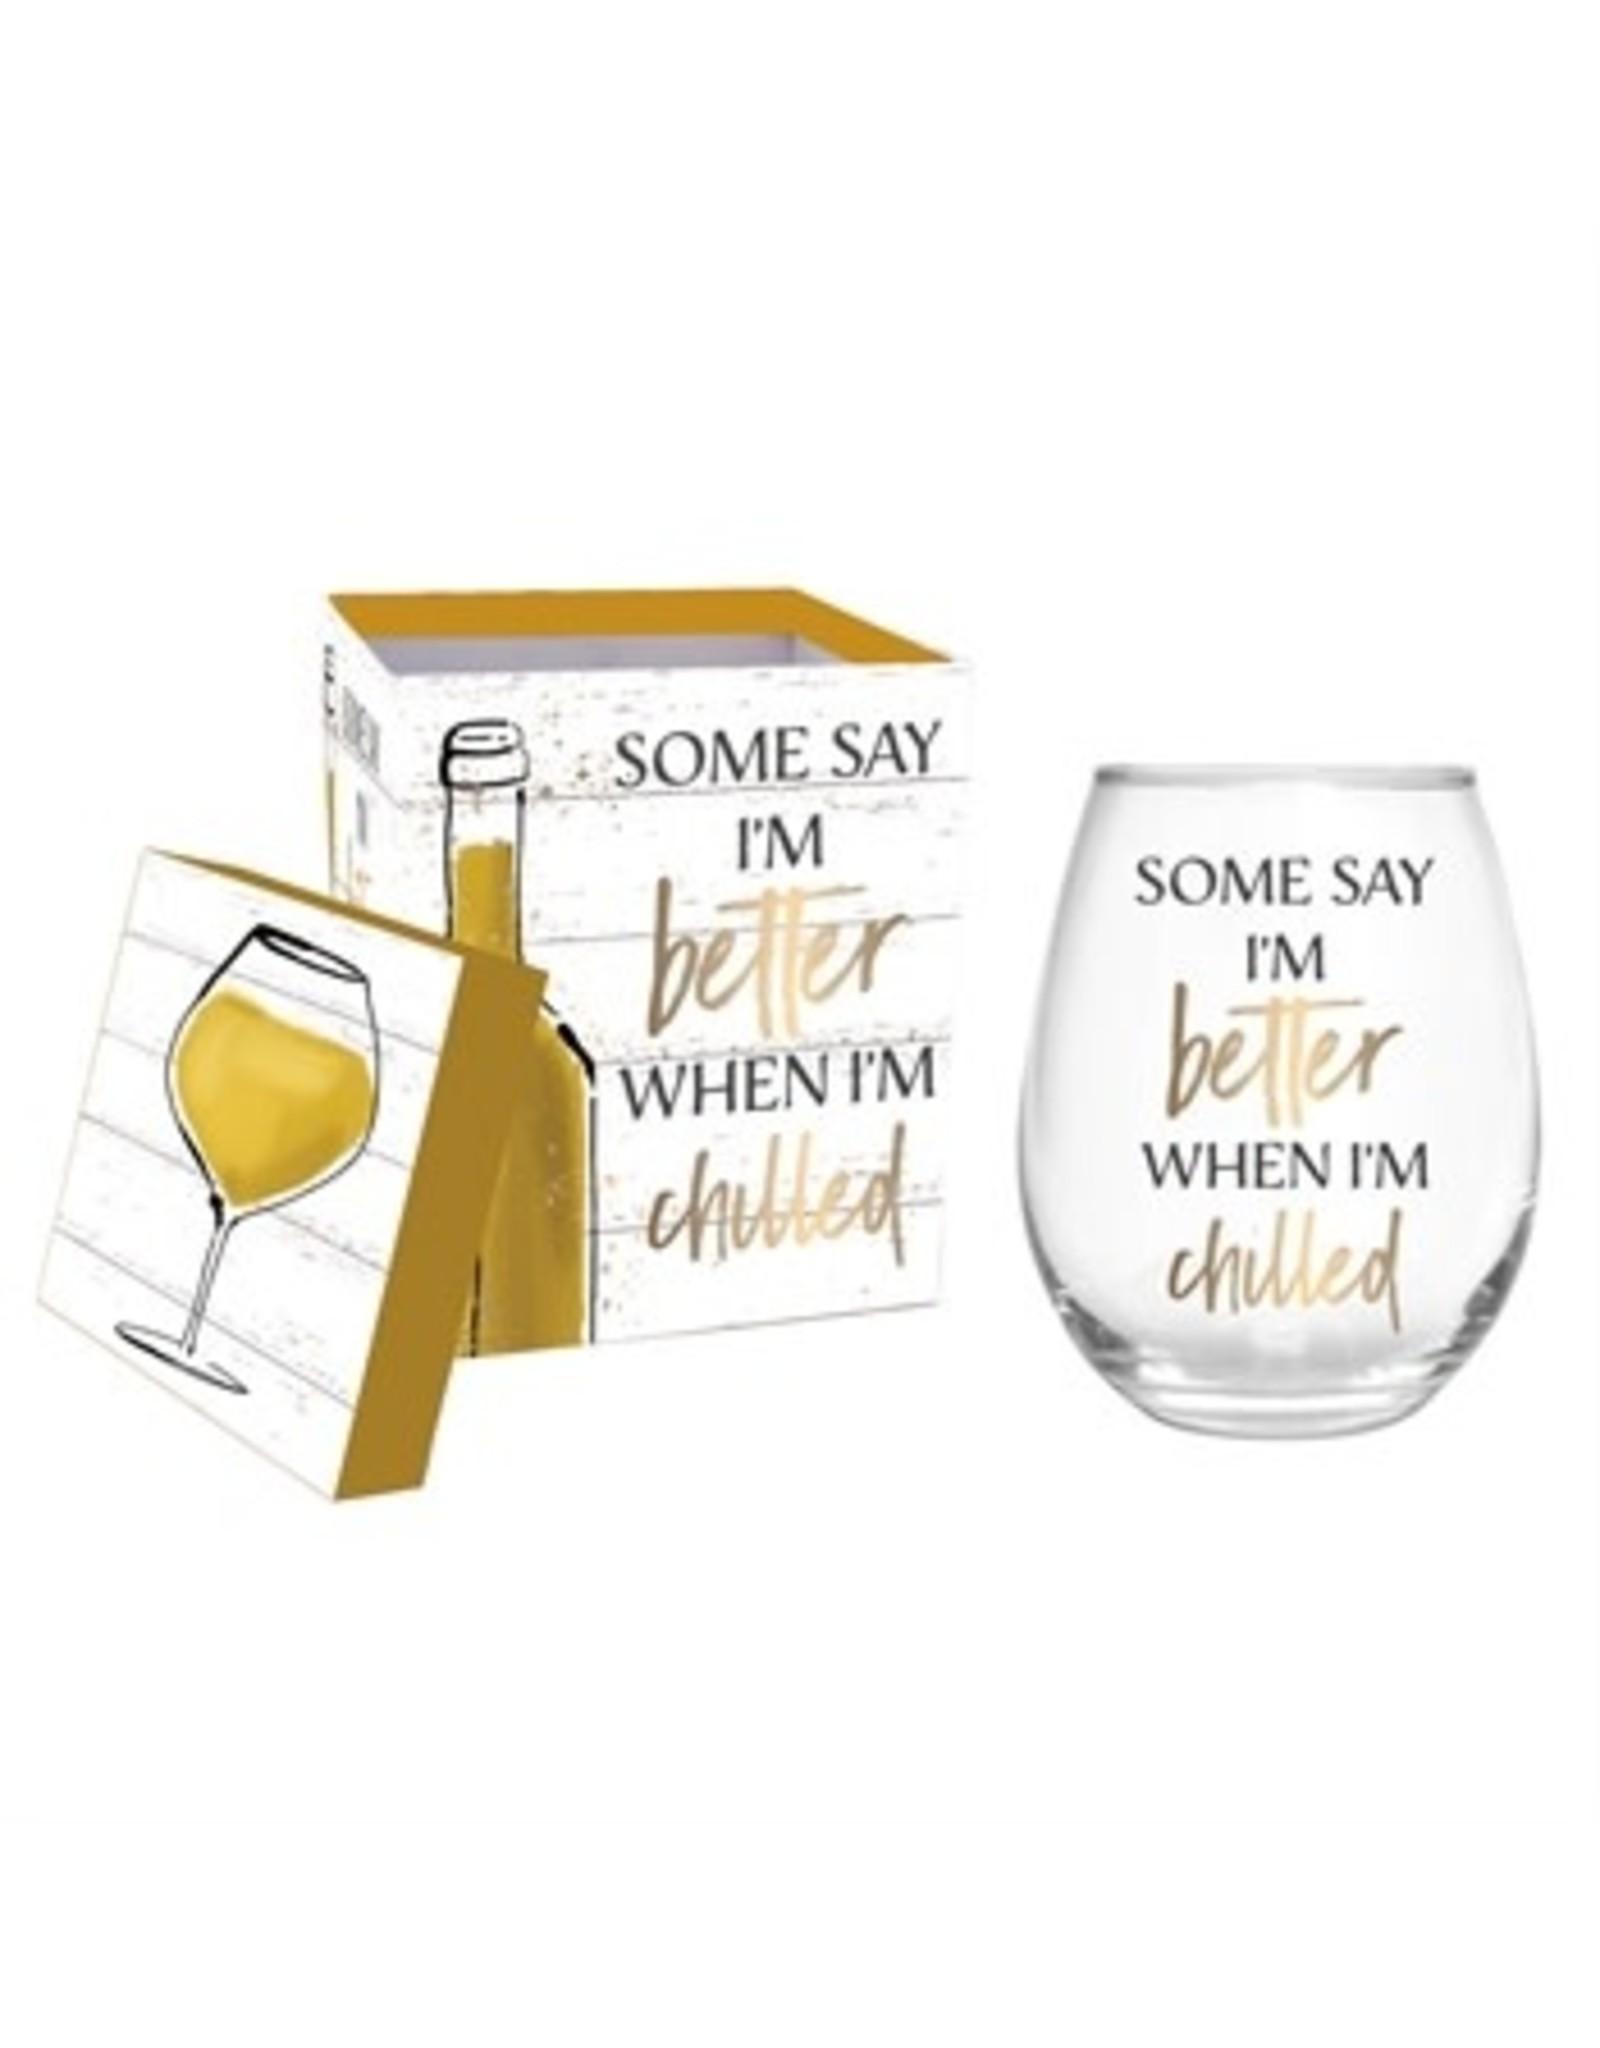 Evergreen Enterprises Stemless Wine Glass w/metallic accents & box